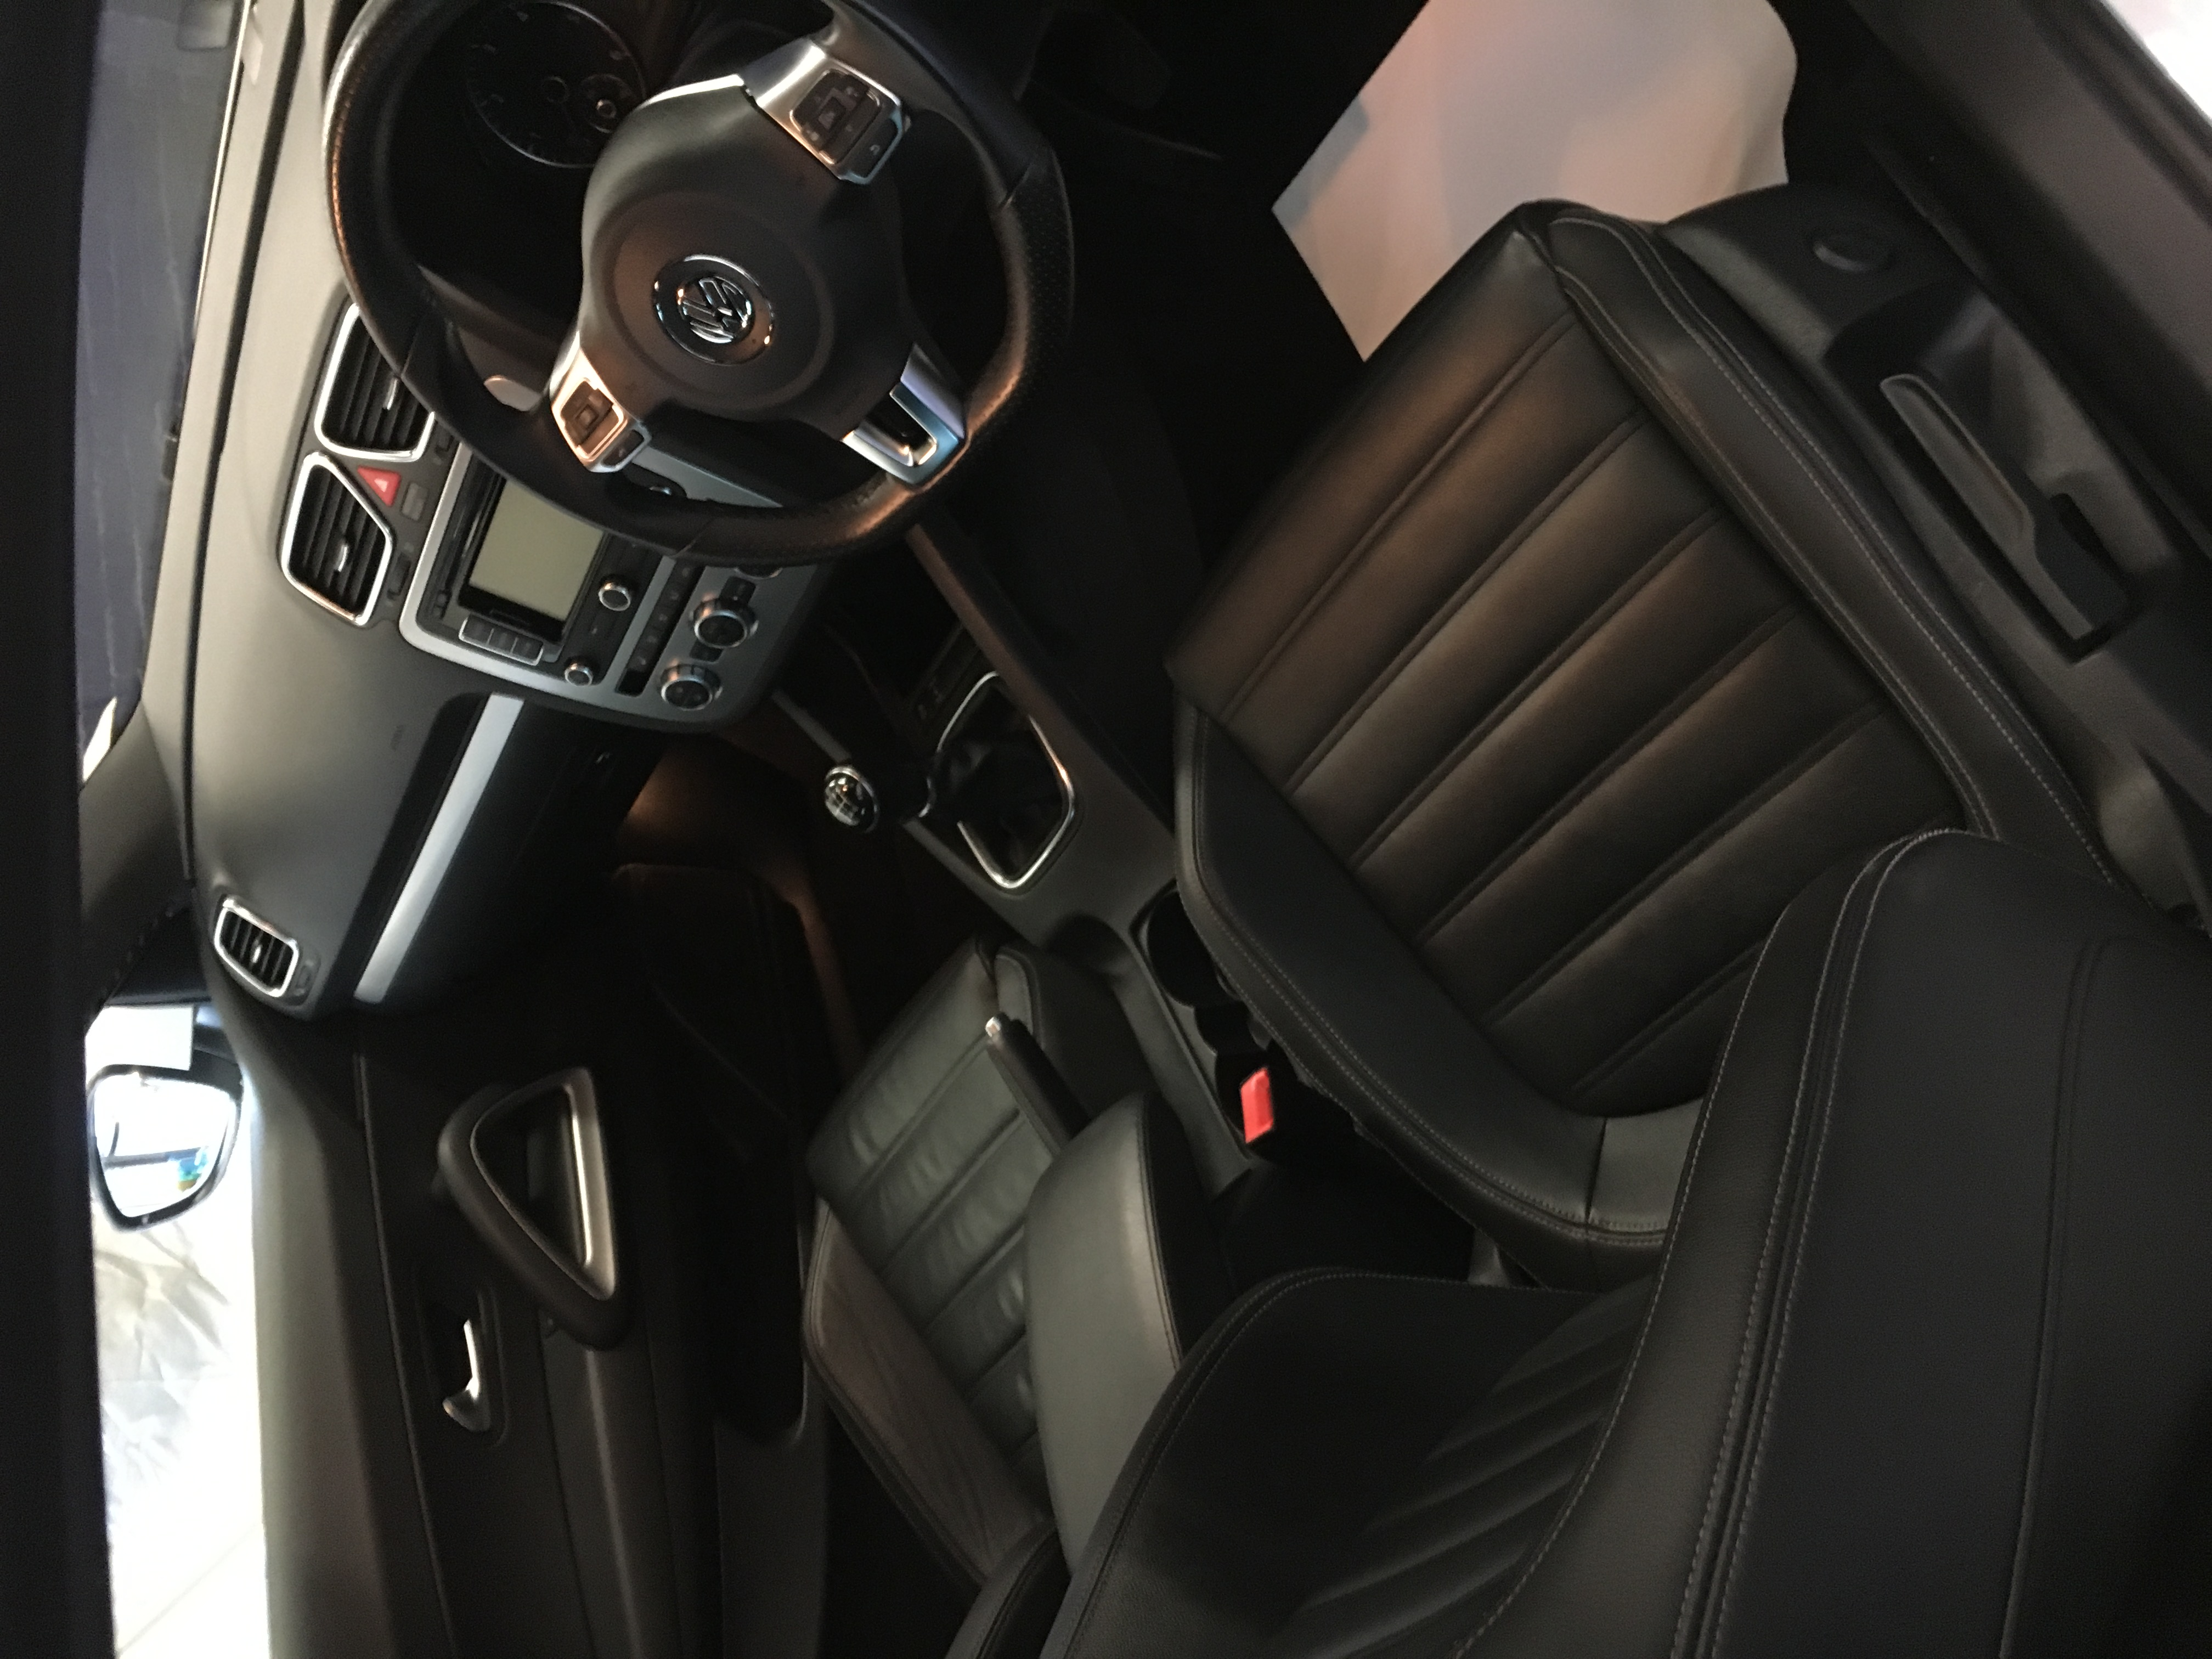 VW Sirocco Inside